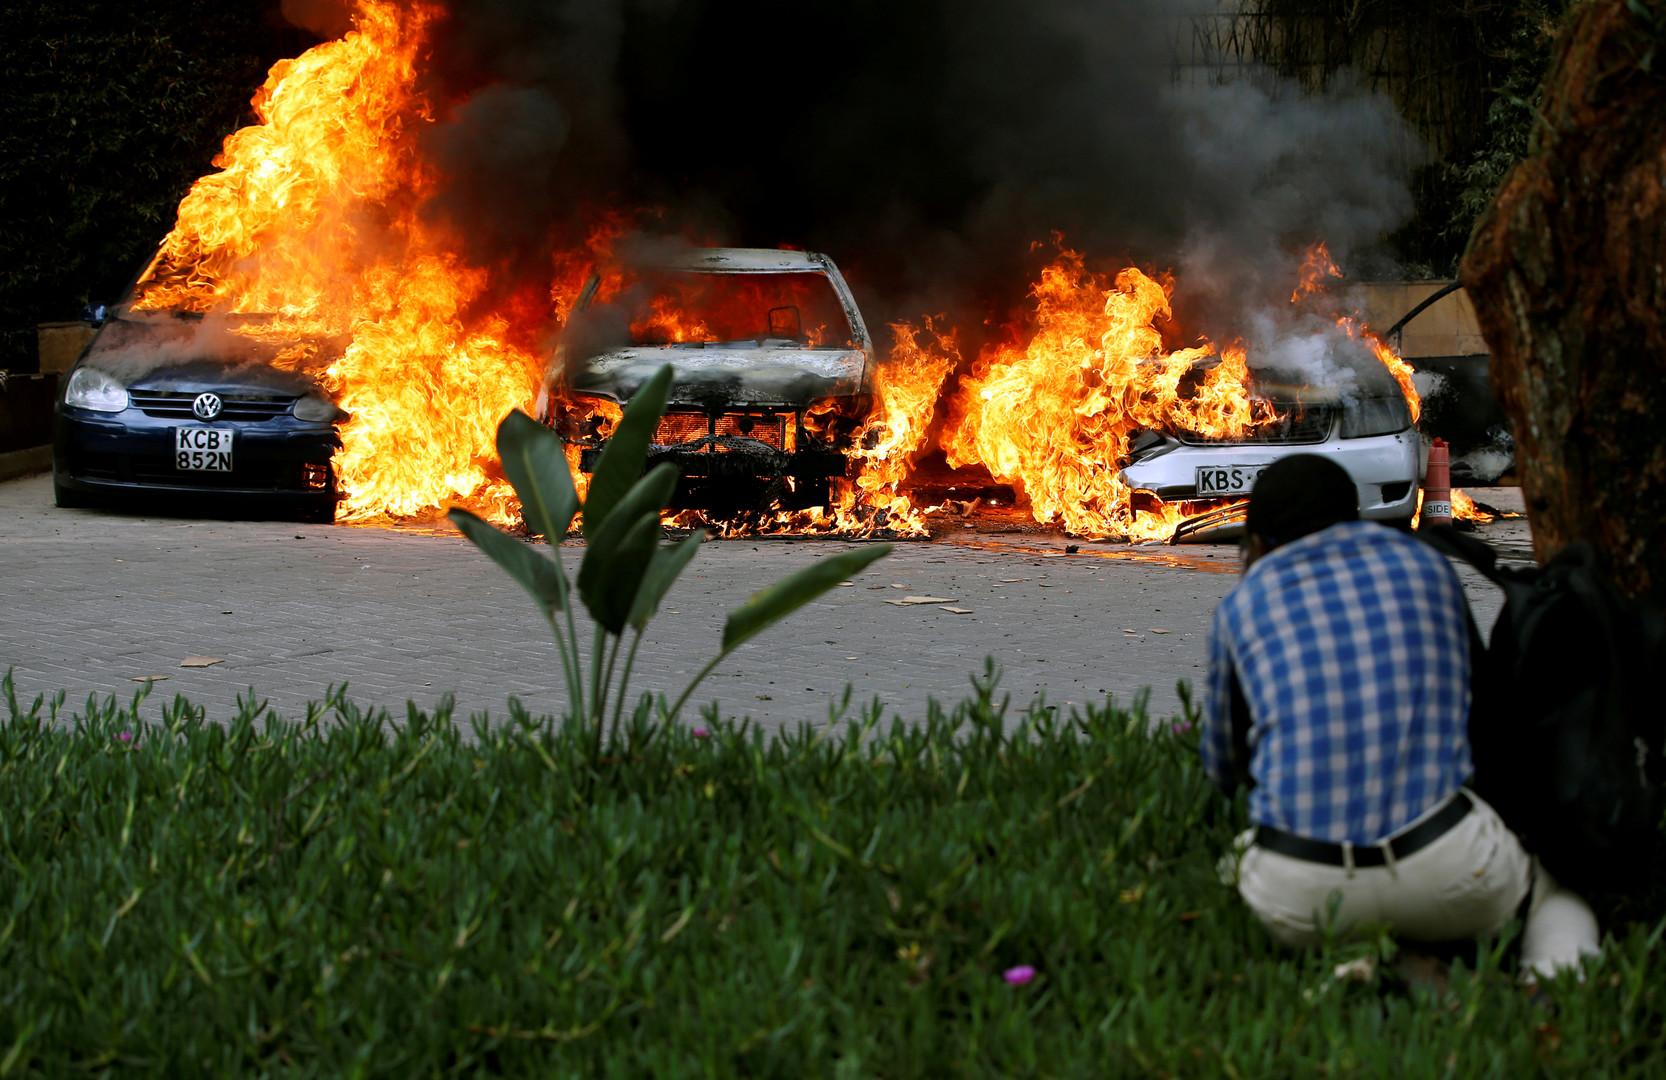 Kenya : 17 morts dans un attentat revendiqué par les djihadistes somaliens shebab